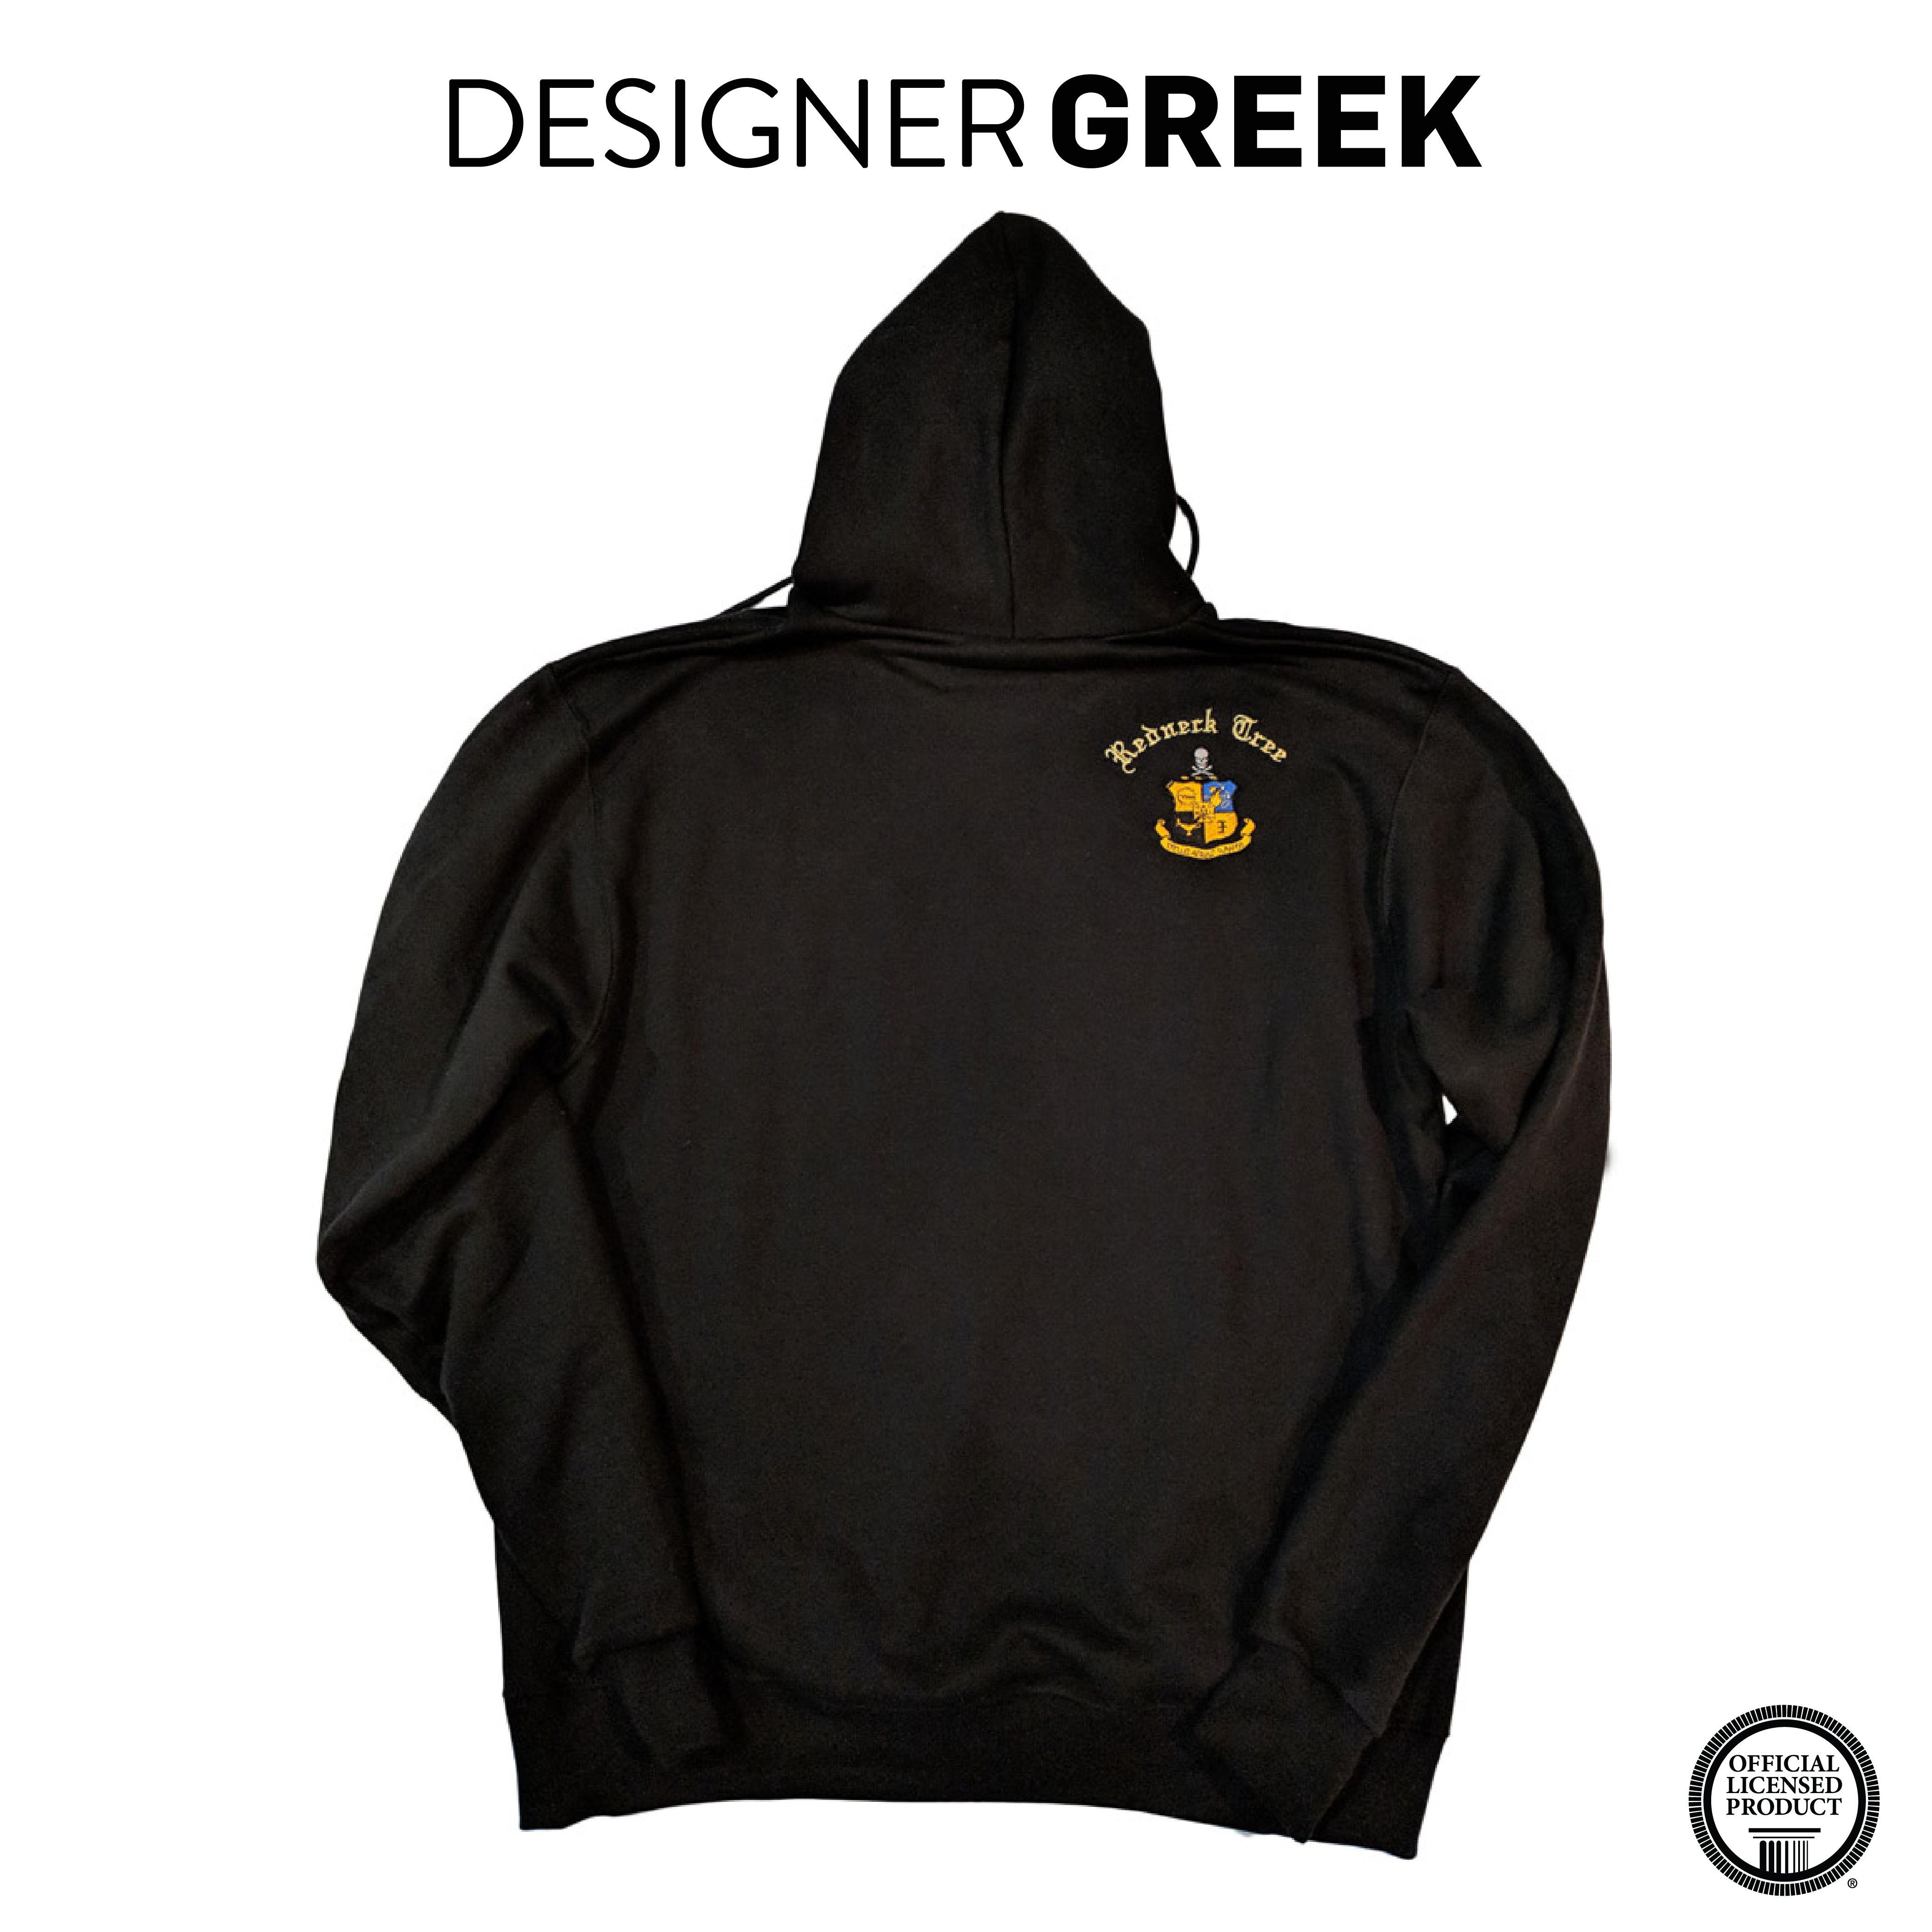 Custom Greek Apparel Fraternity Crests Design Your Own Sweatshirt Designergreek Champion Hooded Sweatshirt Fraternity Sweatshirts Design Your Own Sweatshirt [ 4200 x 4200 Pixel ]